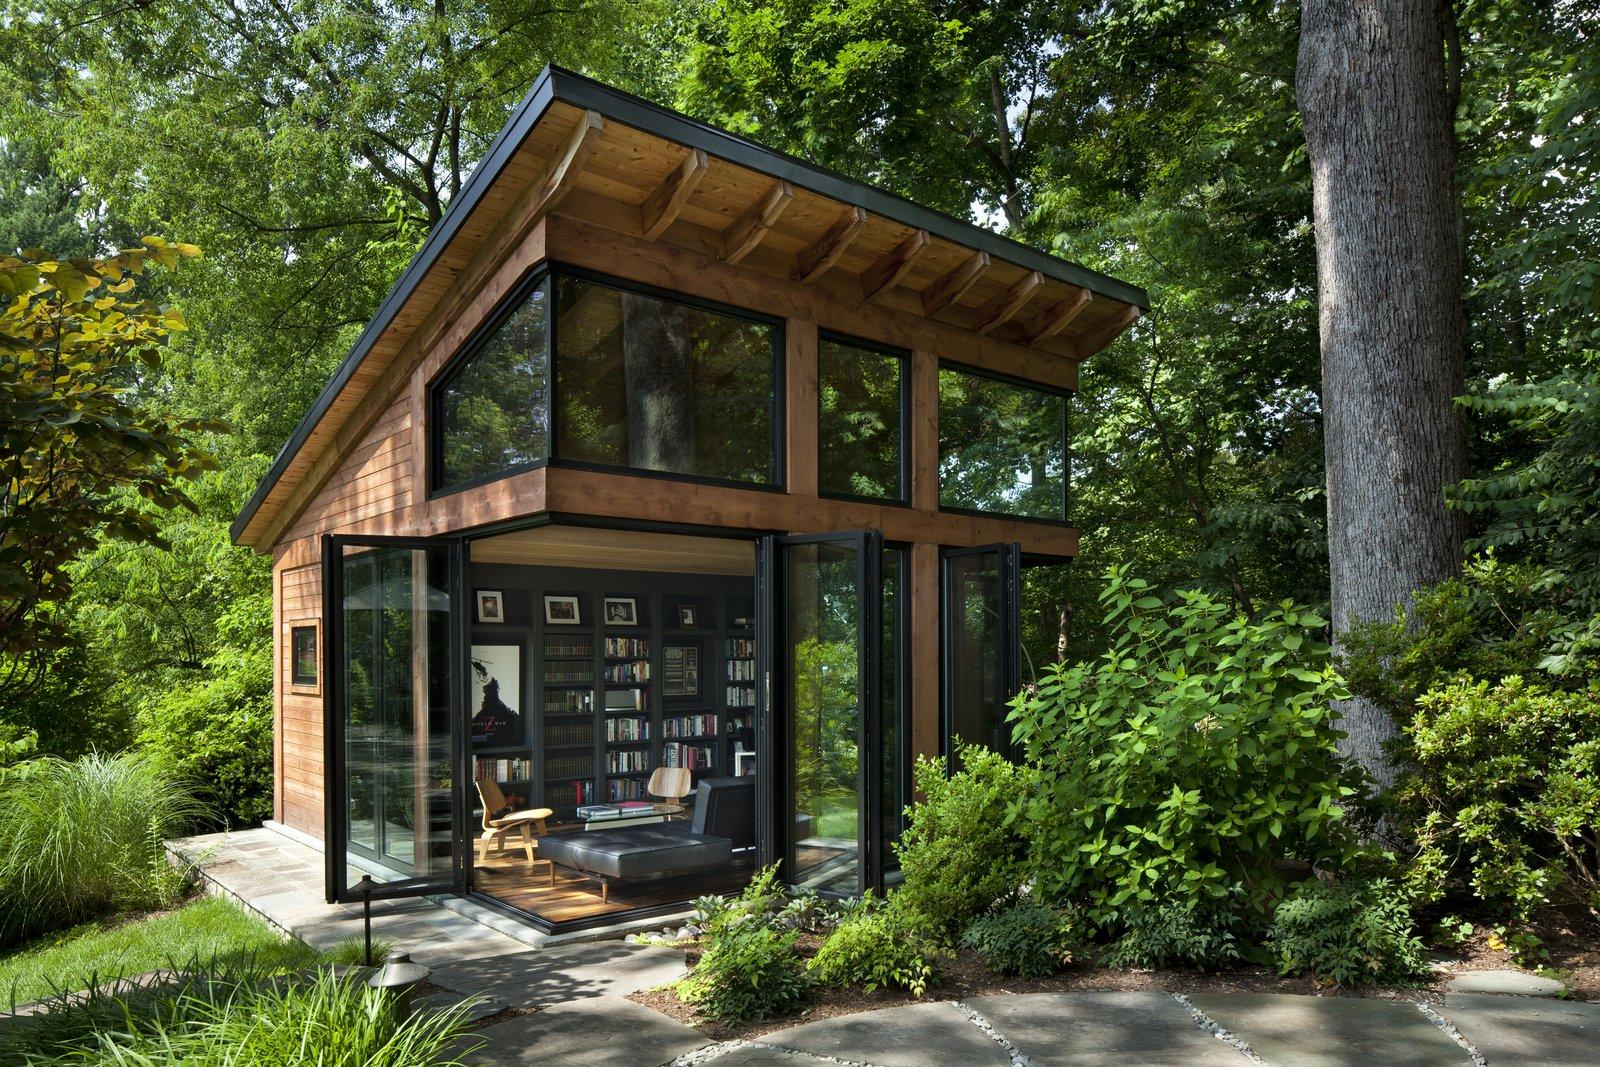 Garden Sheds Design And Ideas For Modern Homes Living